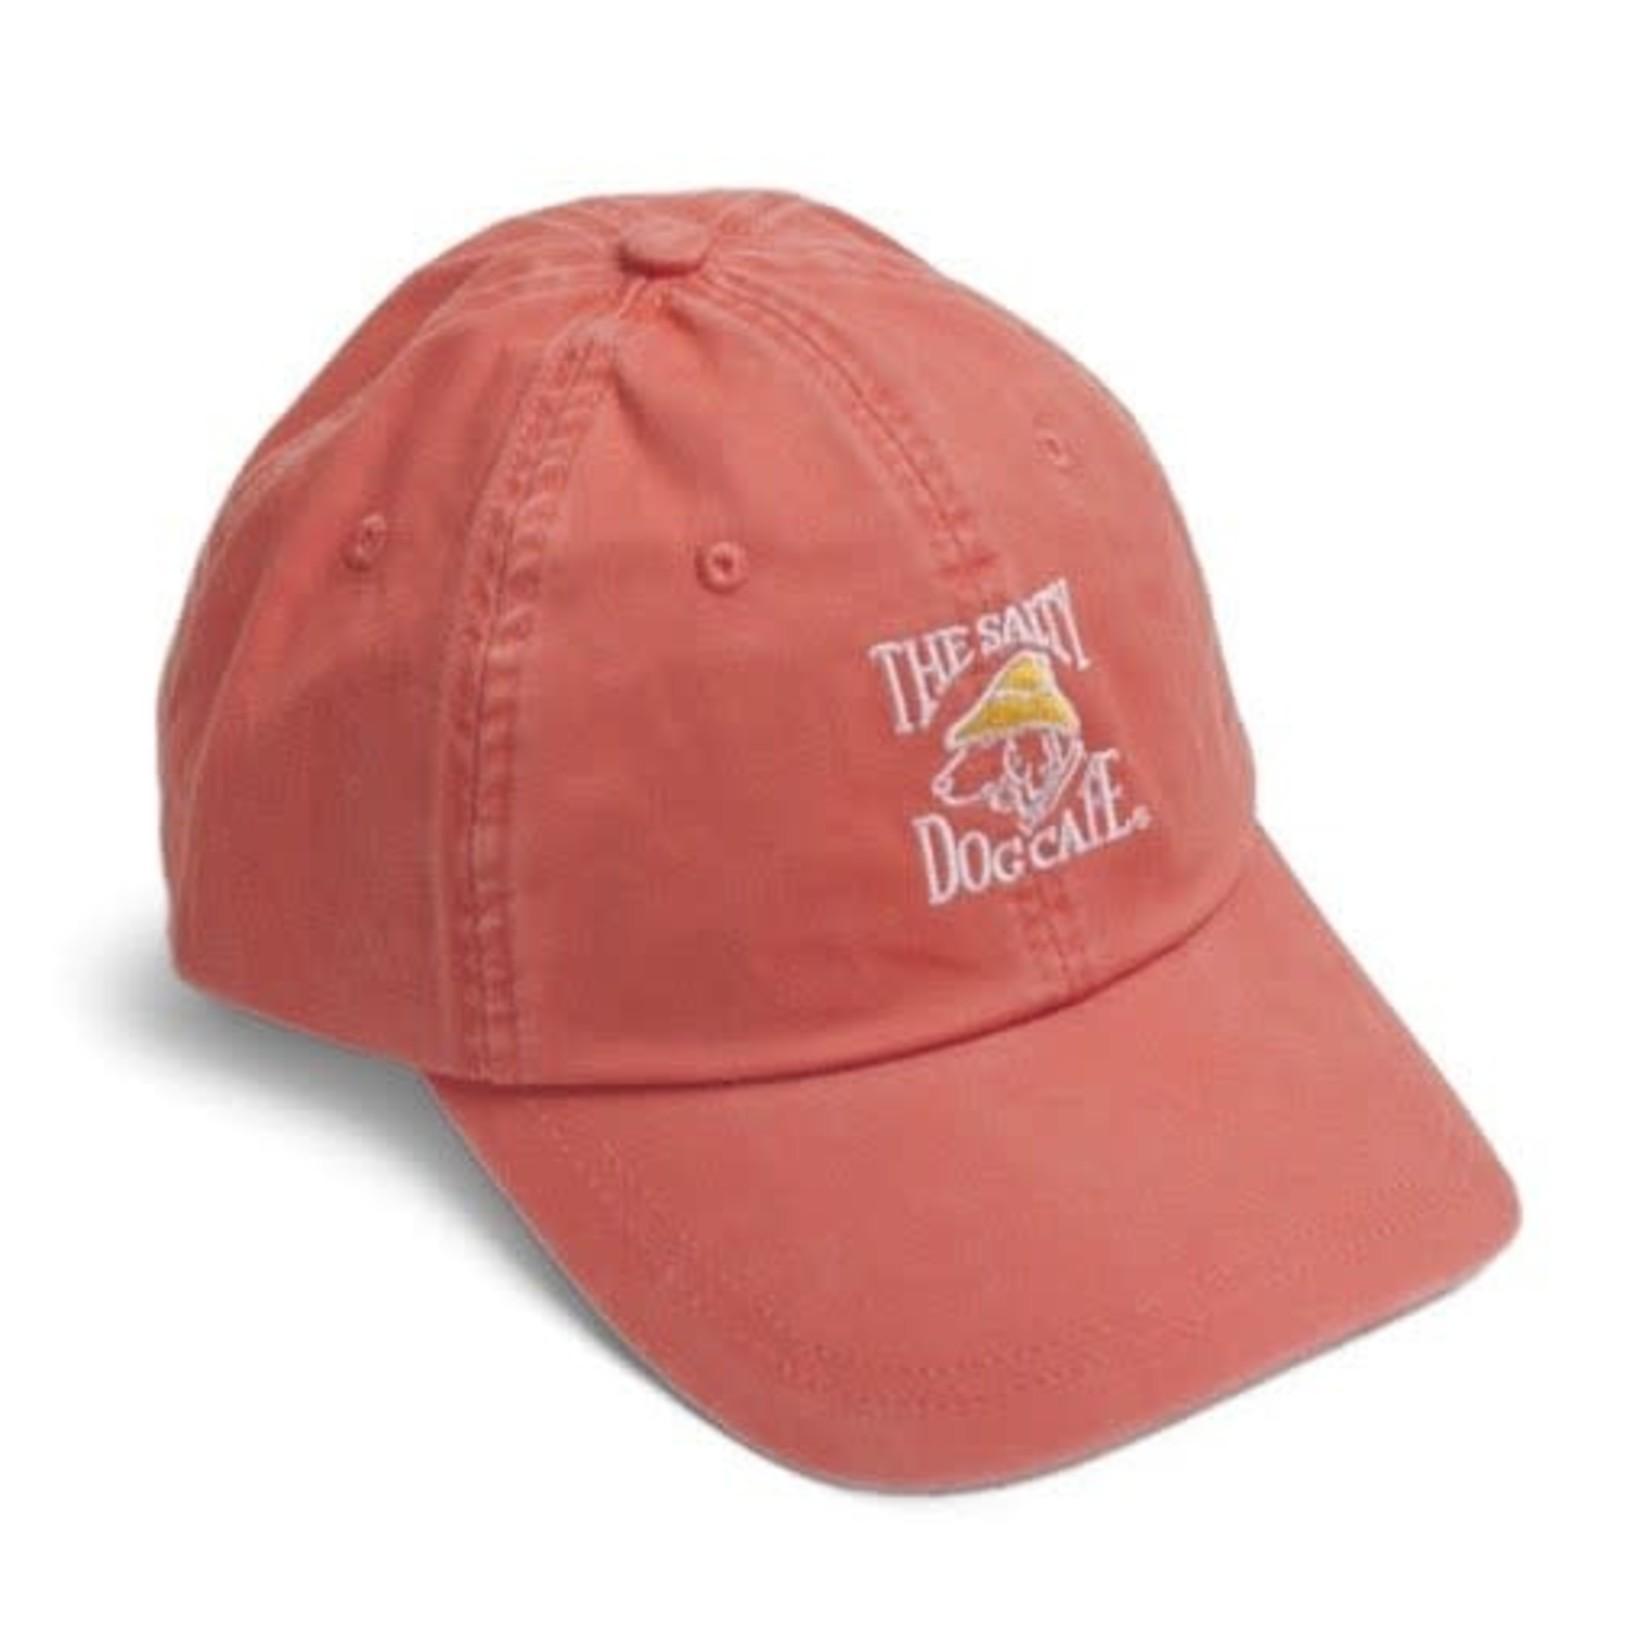 Hat - Women's Fit - Sorbet - Adult